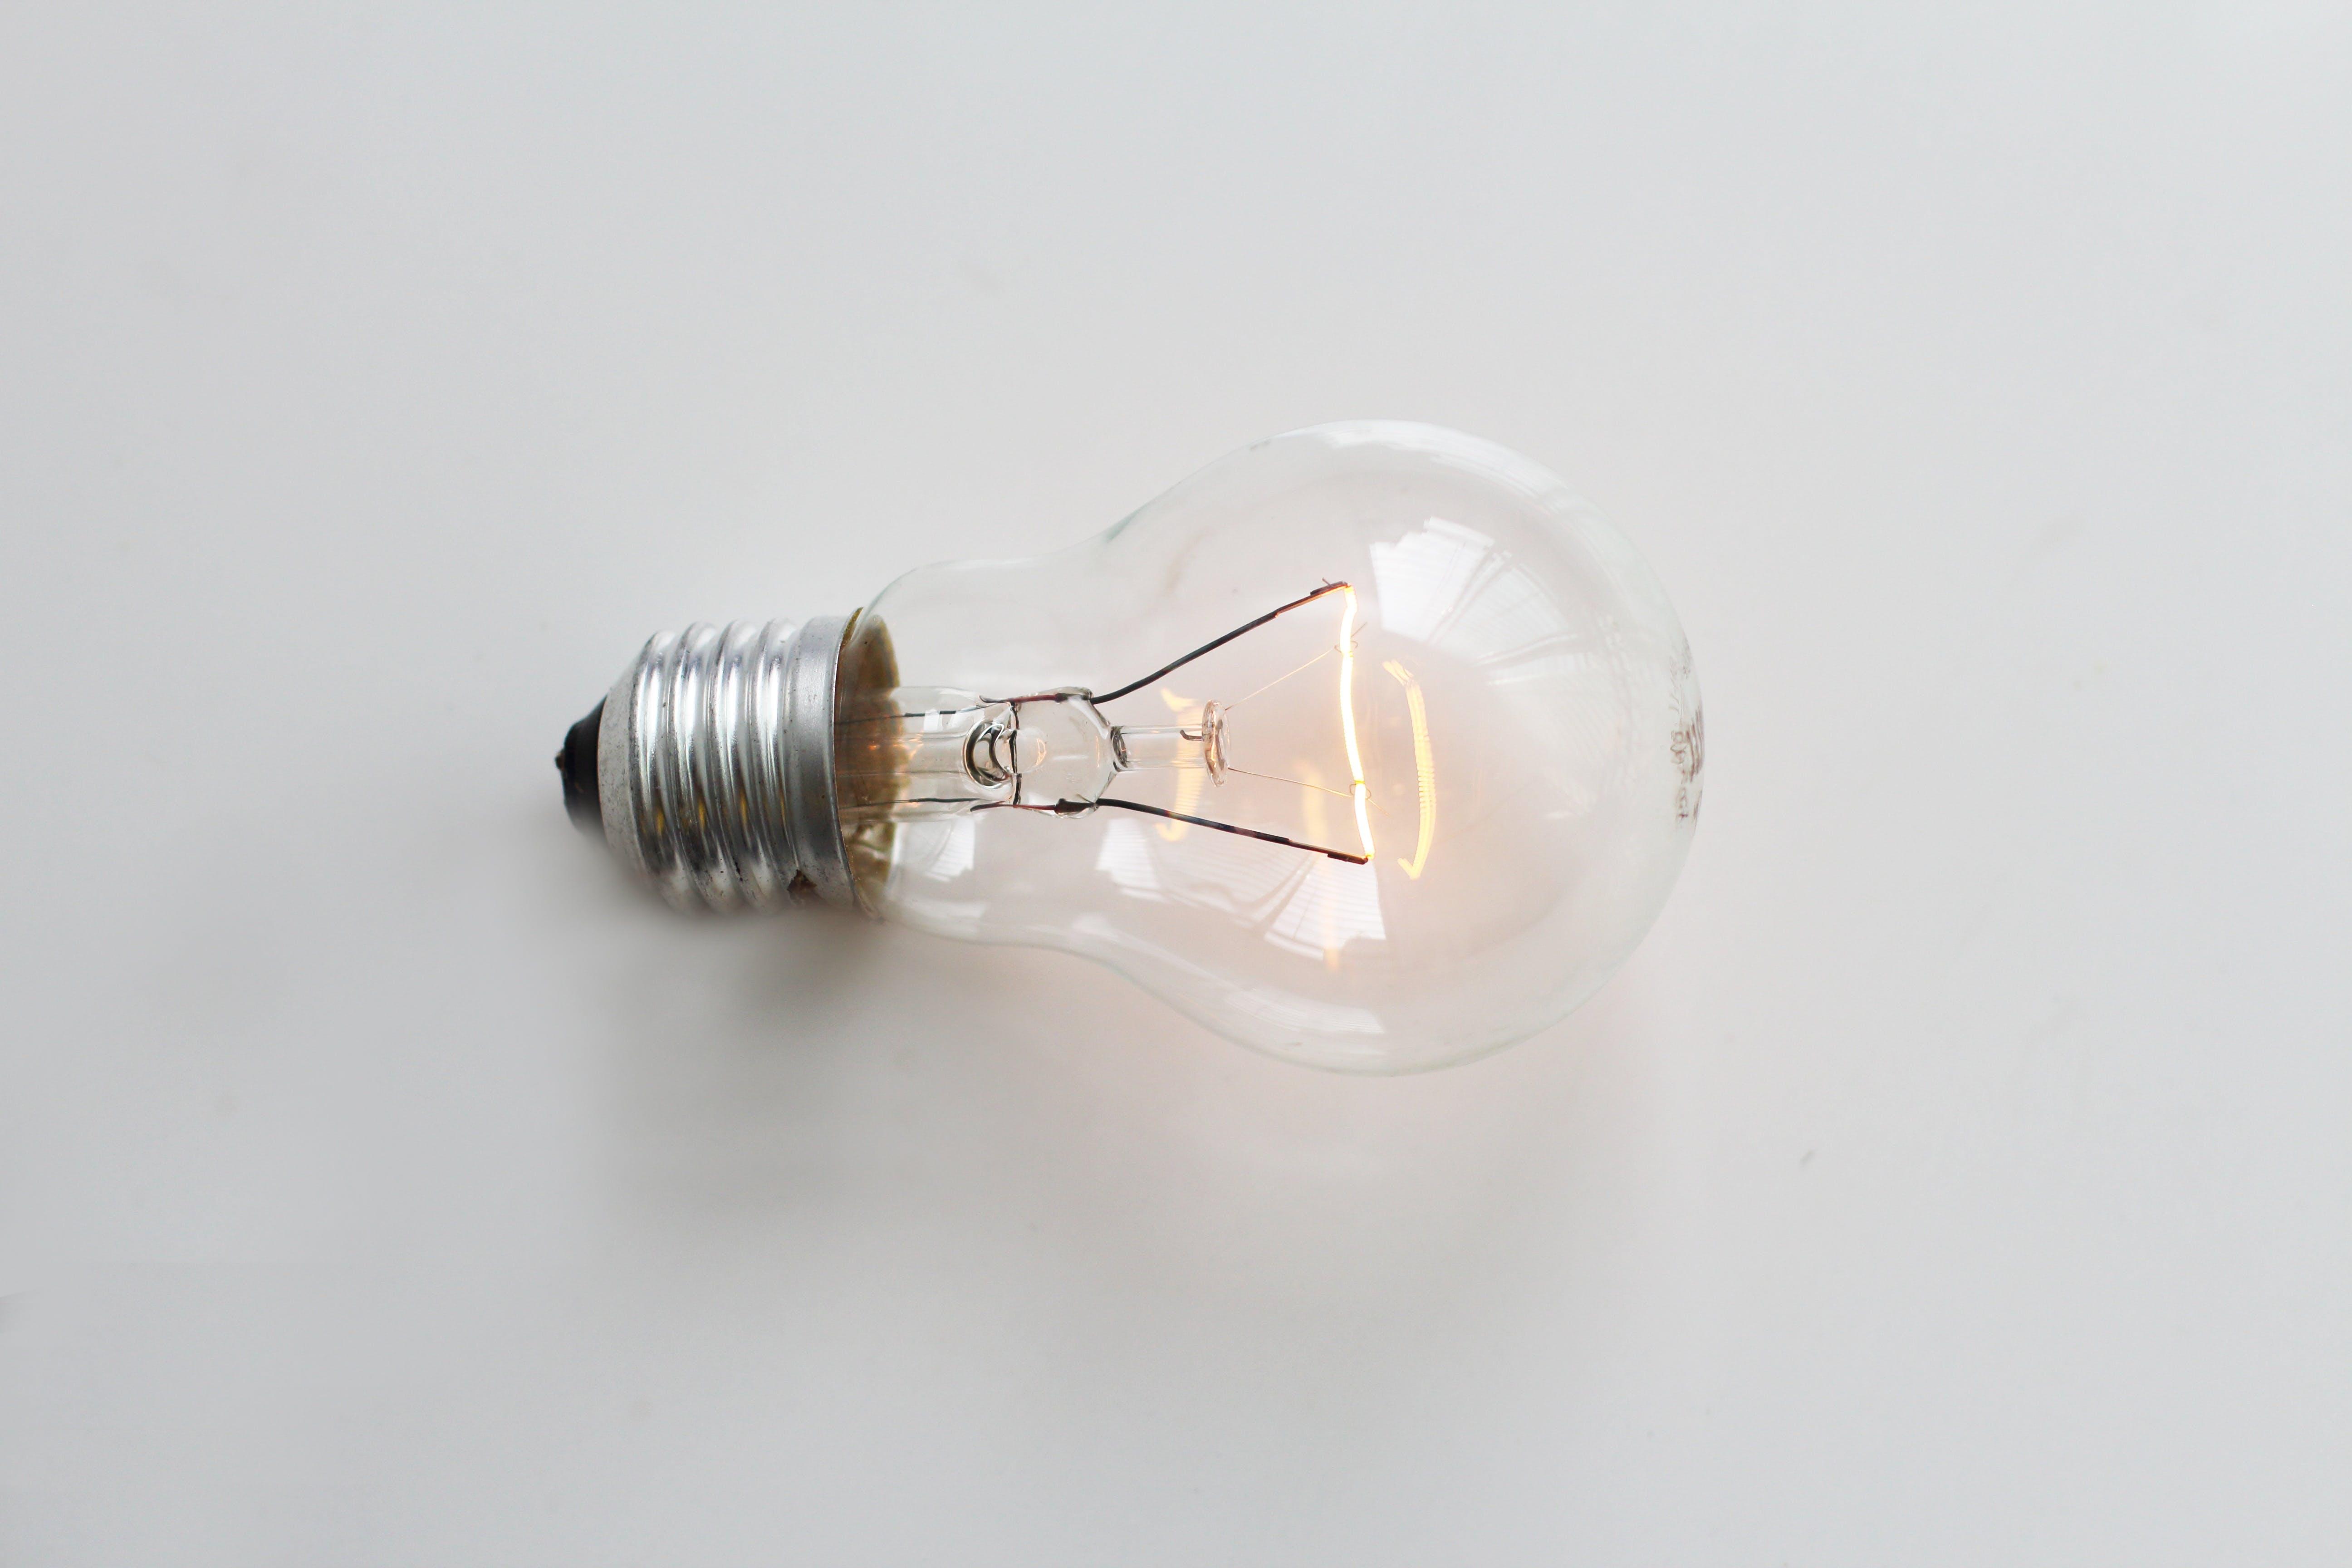 elektrický, elektřina, energie